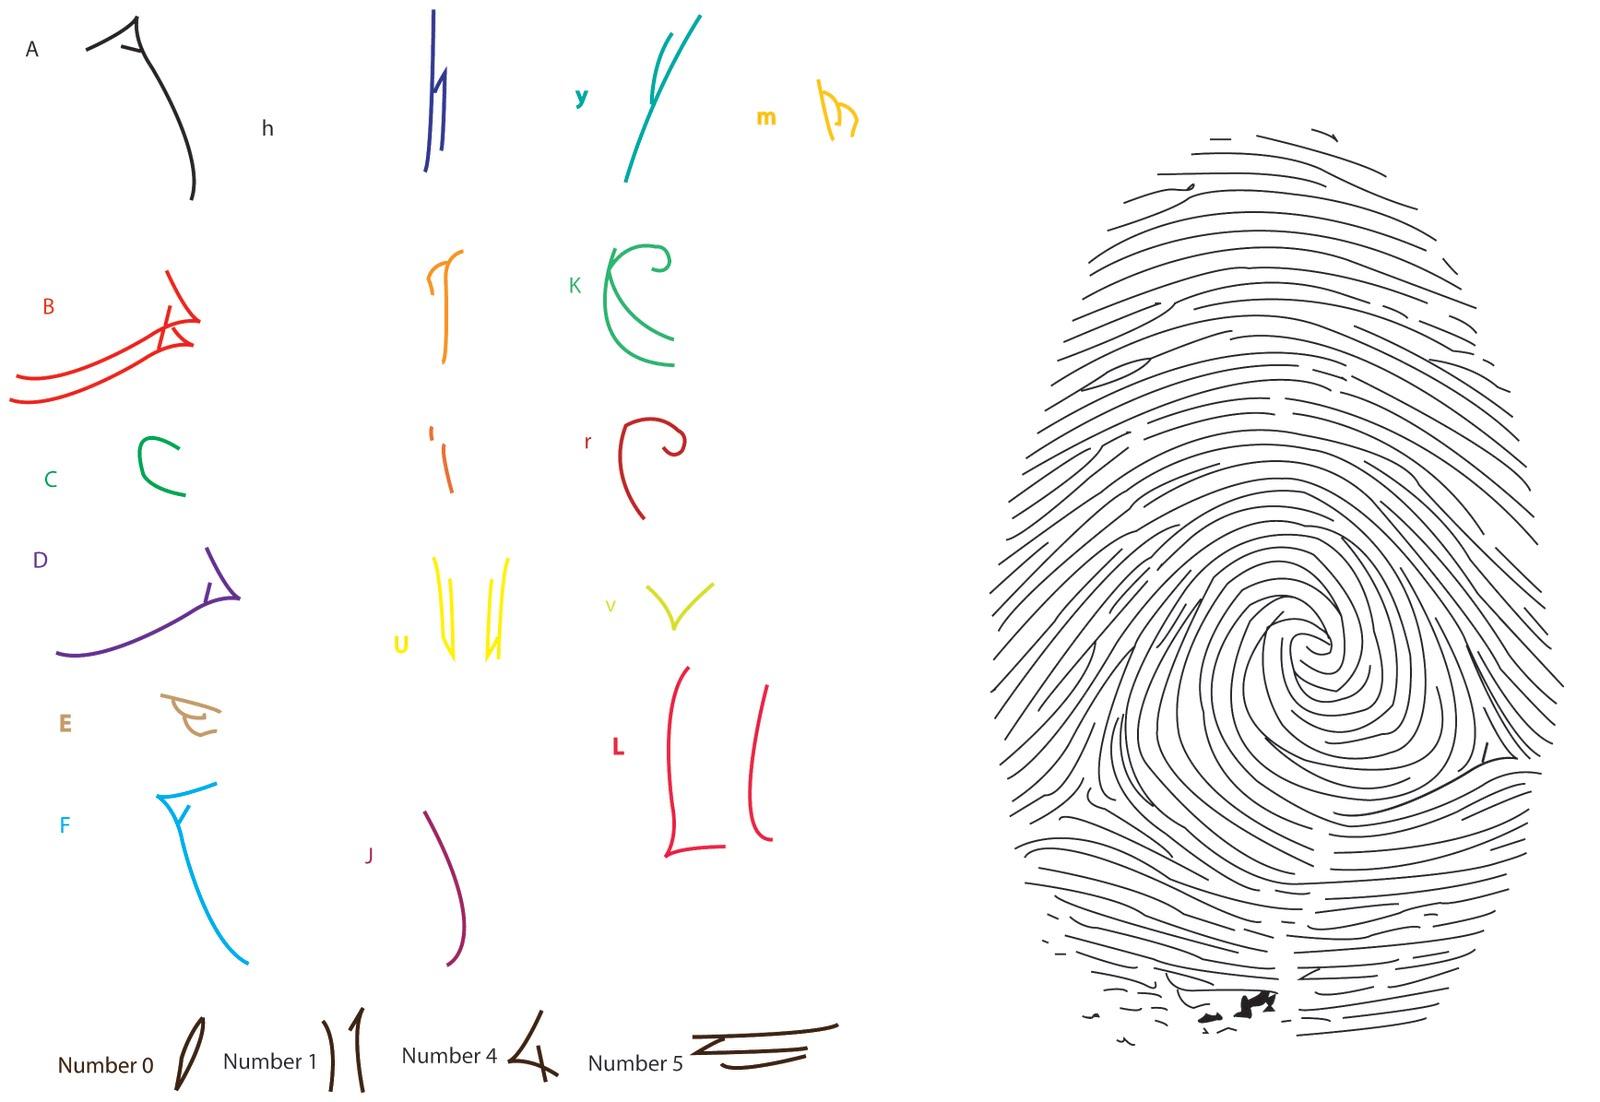 http://4.bp.blogspot.com/_BSwT0OnmXiM/S8H-piXemTI/AAAAAAAAAKs/TqBF-ZlT6Rw/s1600/letters+found+out+of+fingerprint.jpg